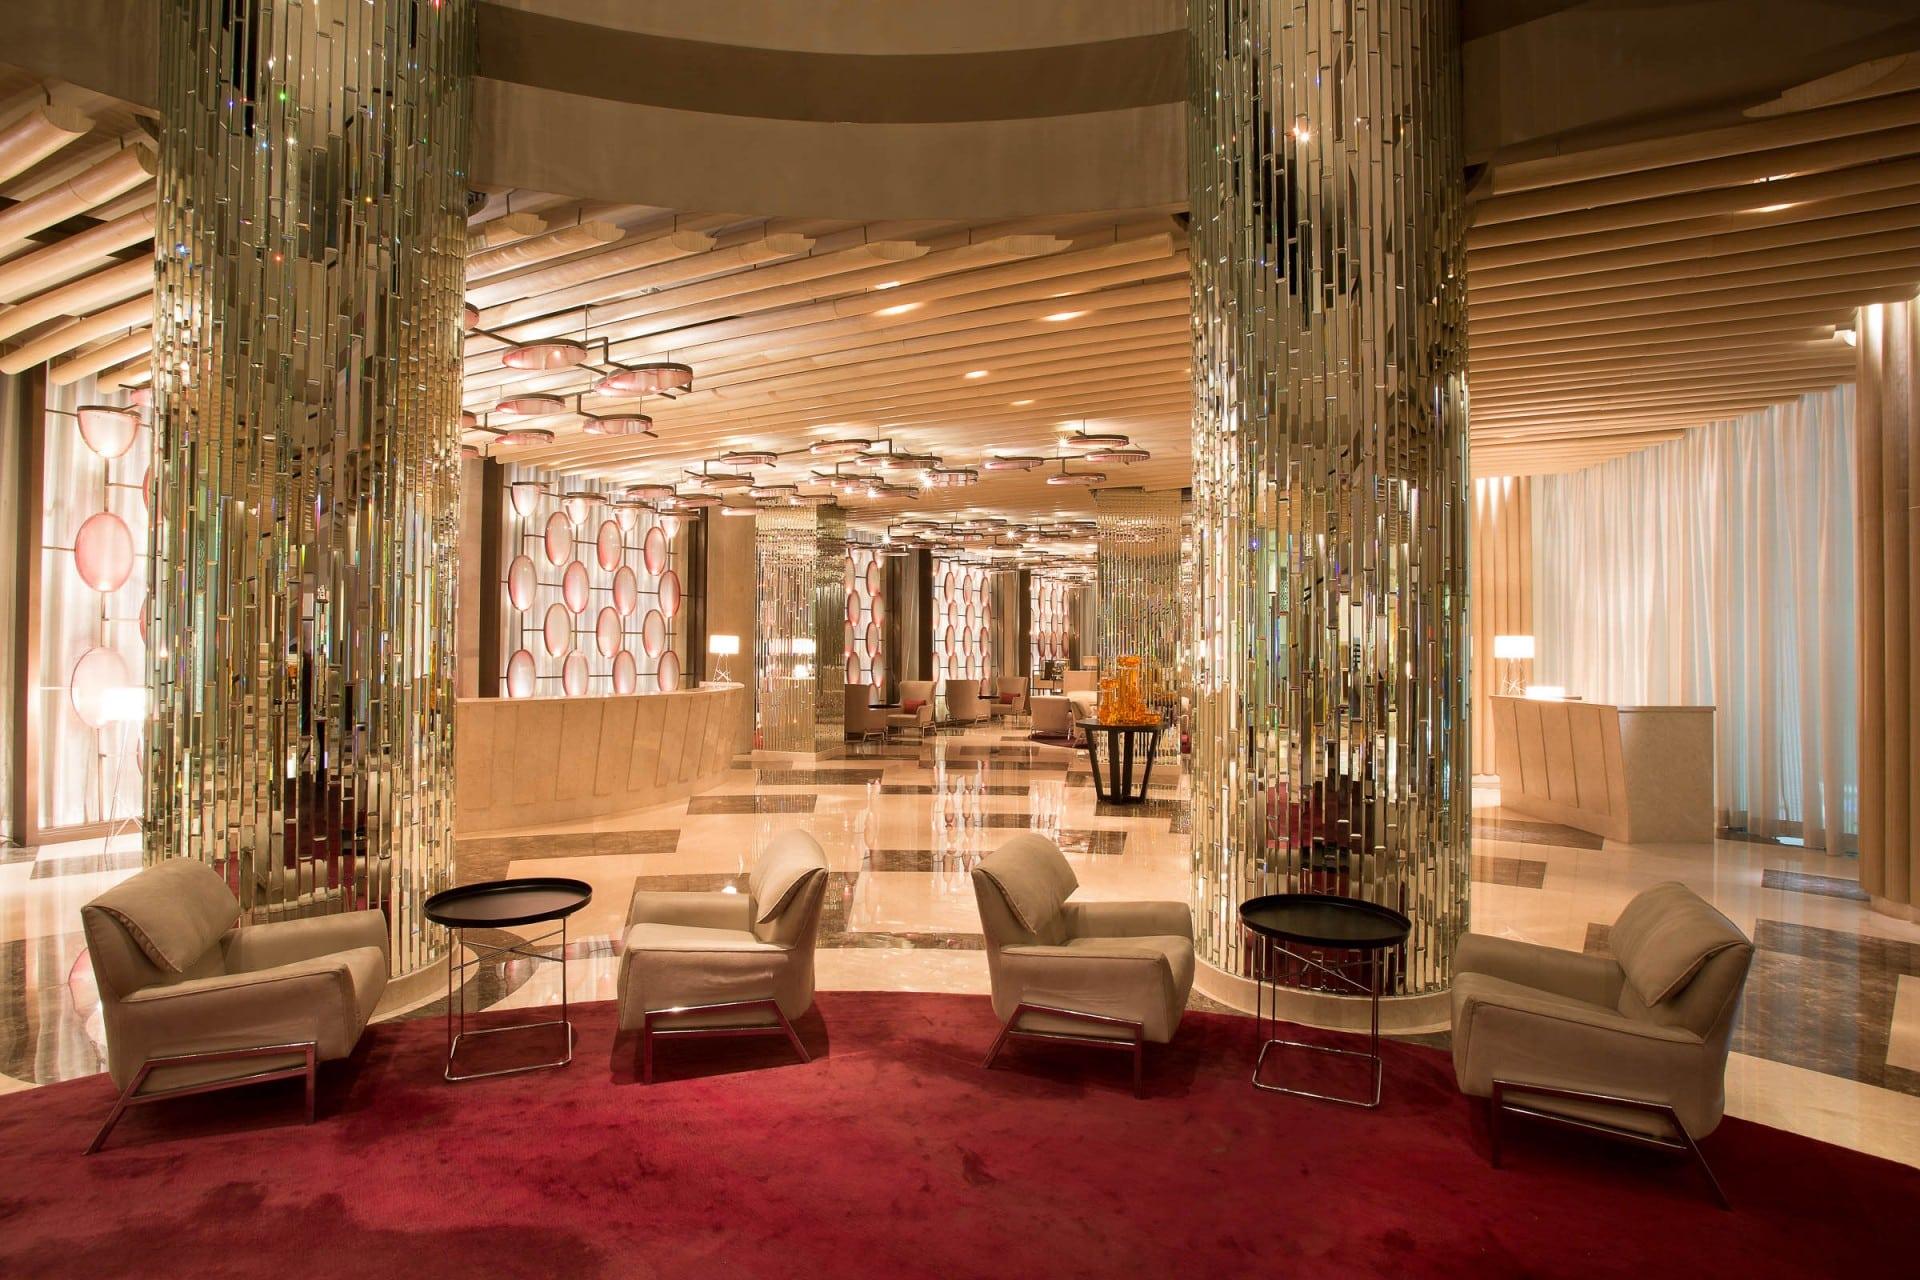 Best Architecture Photographer New Delhi   ITC Hotel Lobby Photography India